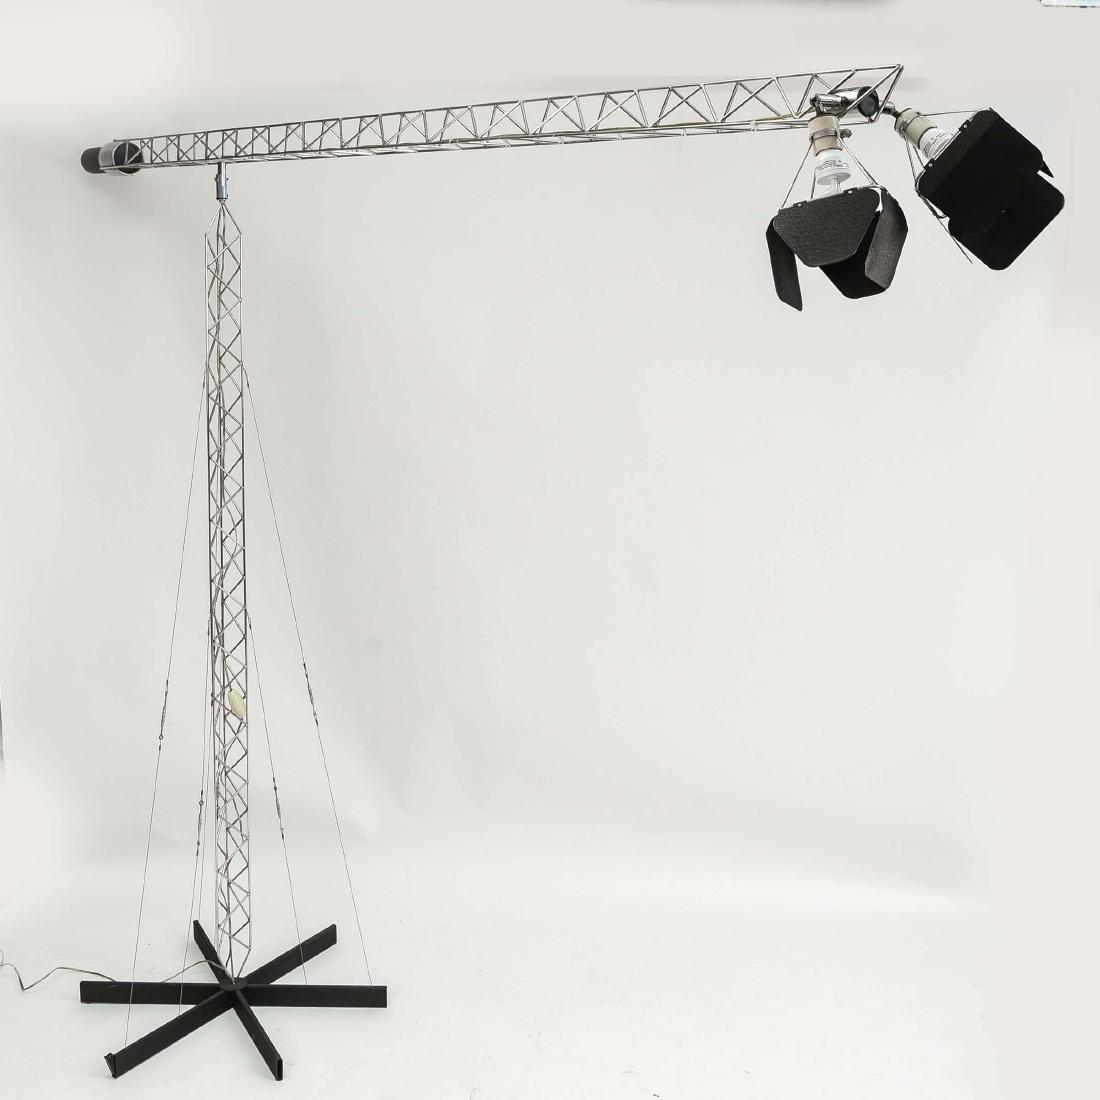 C. JERE CRANE TRUSS COUNTERBALANCE FLOOR LAMP